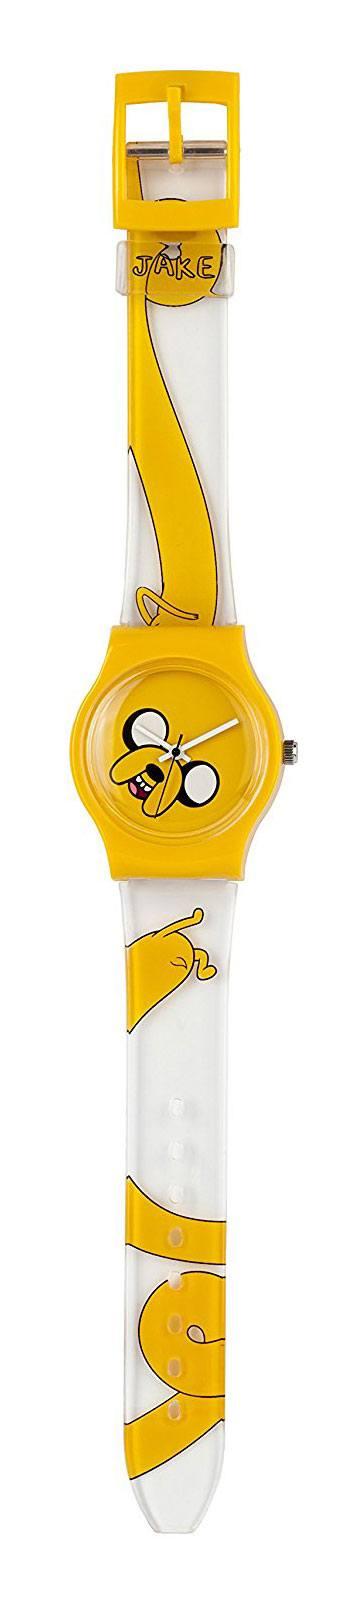 Adventure Time Quartz Watch Jake